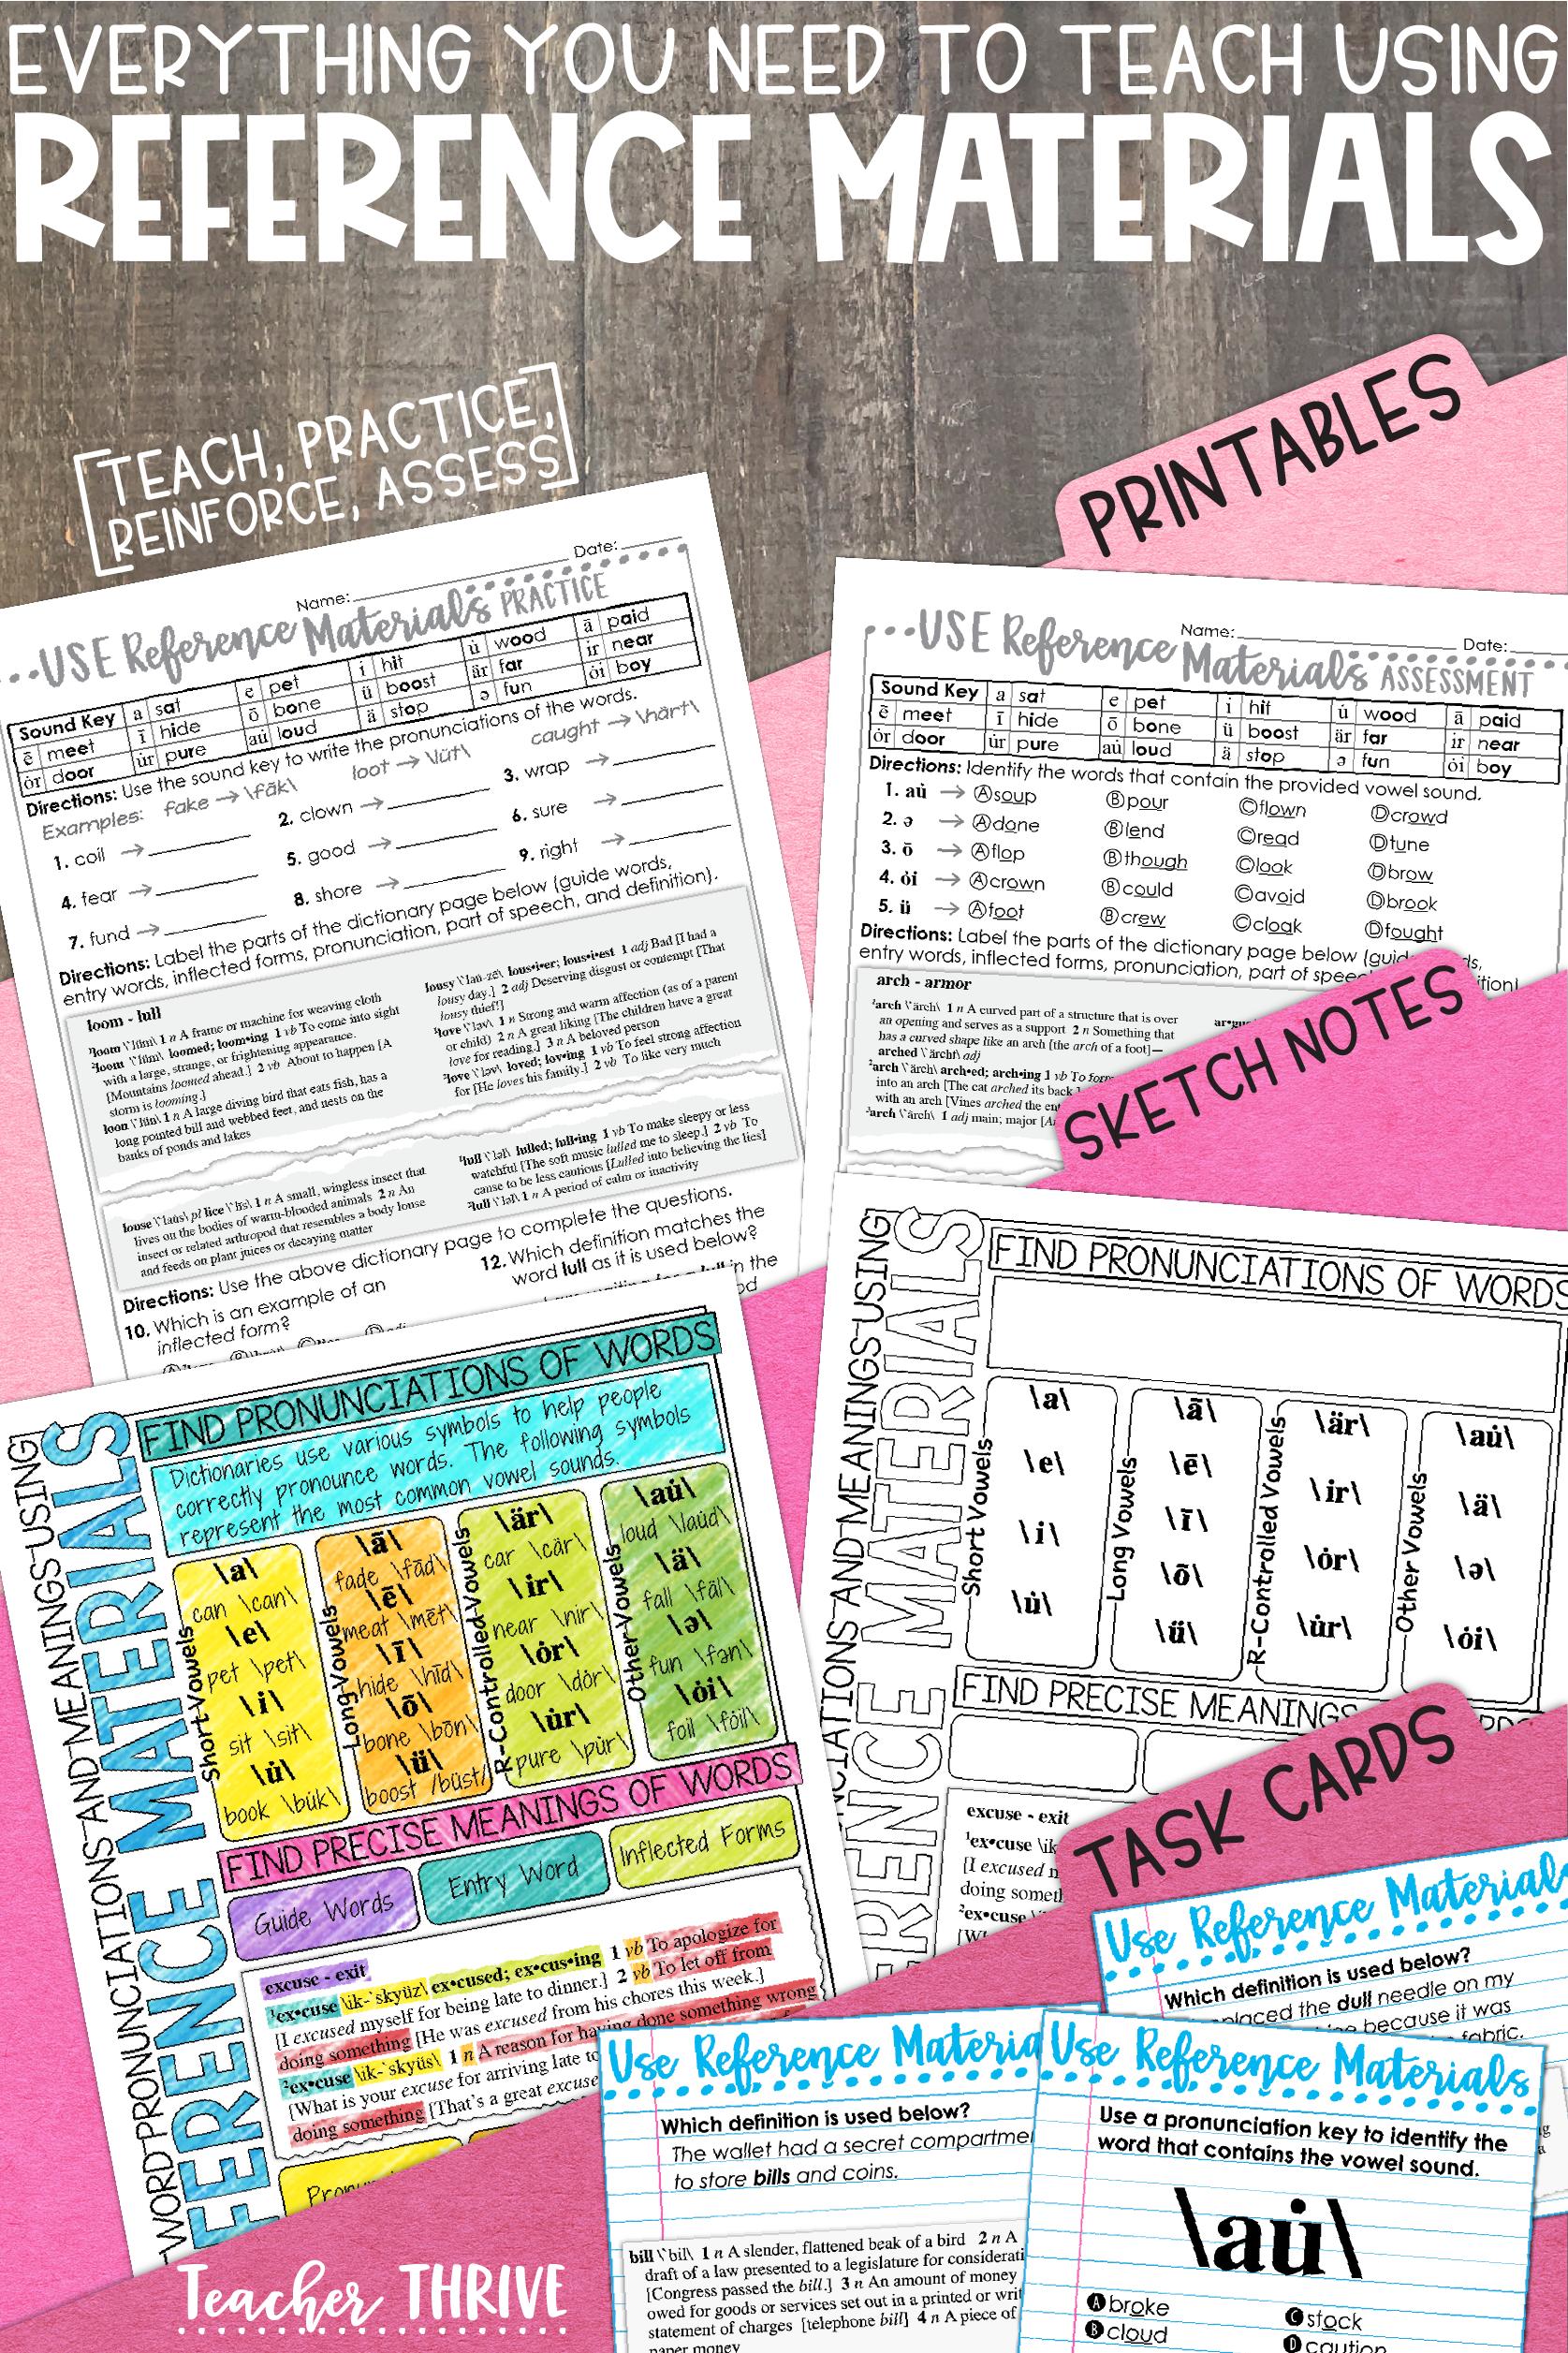 Fifth Grade Grammar: Use Reference Materials • Teacher Thrive   Teaching  vocabulary [ 2513 x 1675 Pixel ]